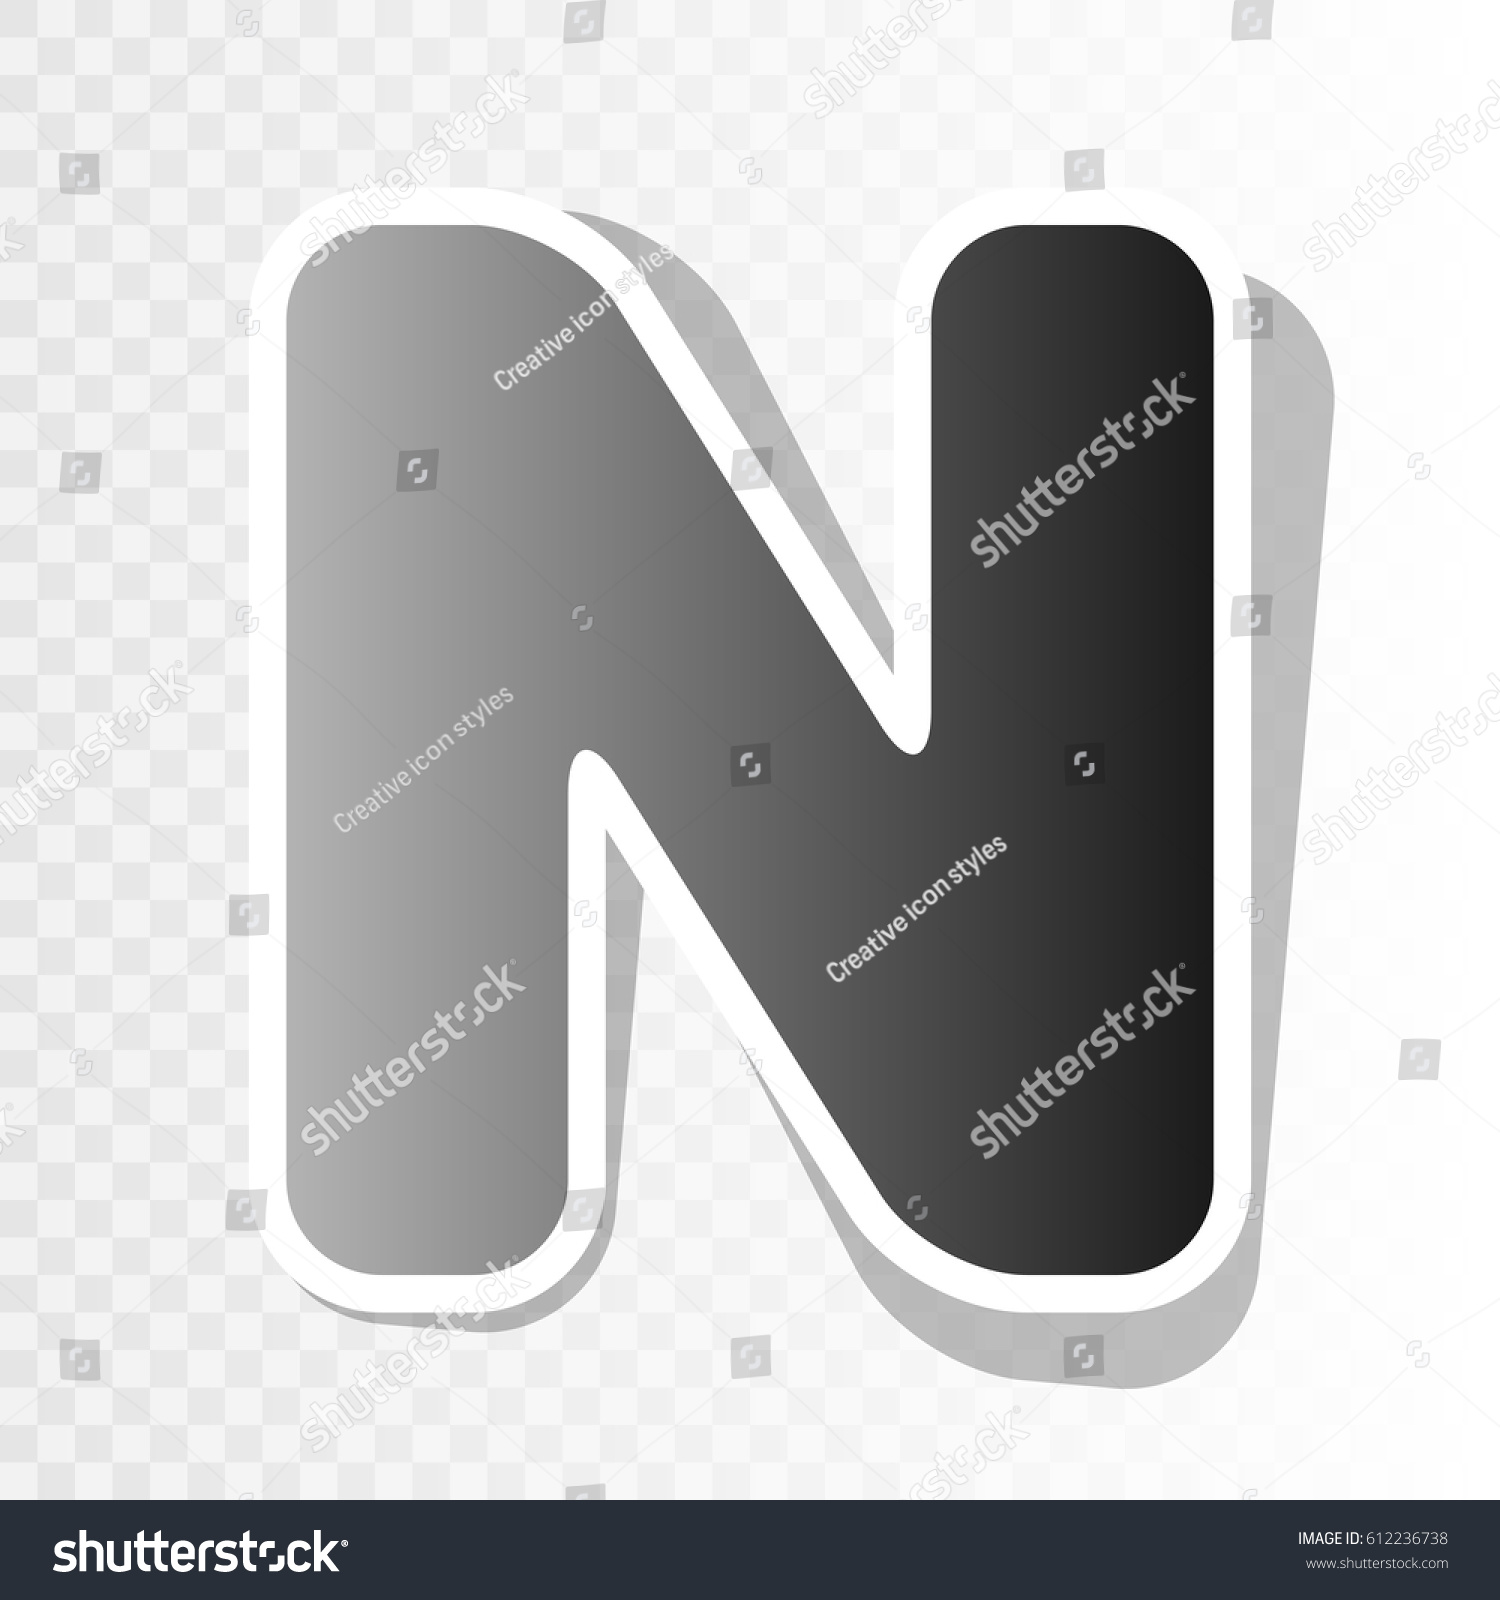 Letter N Sign Design Template Element Stock Vector 612236738 ...